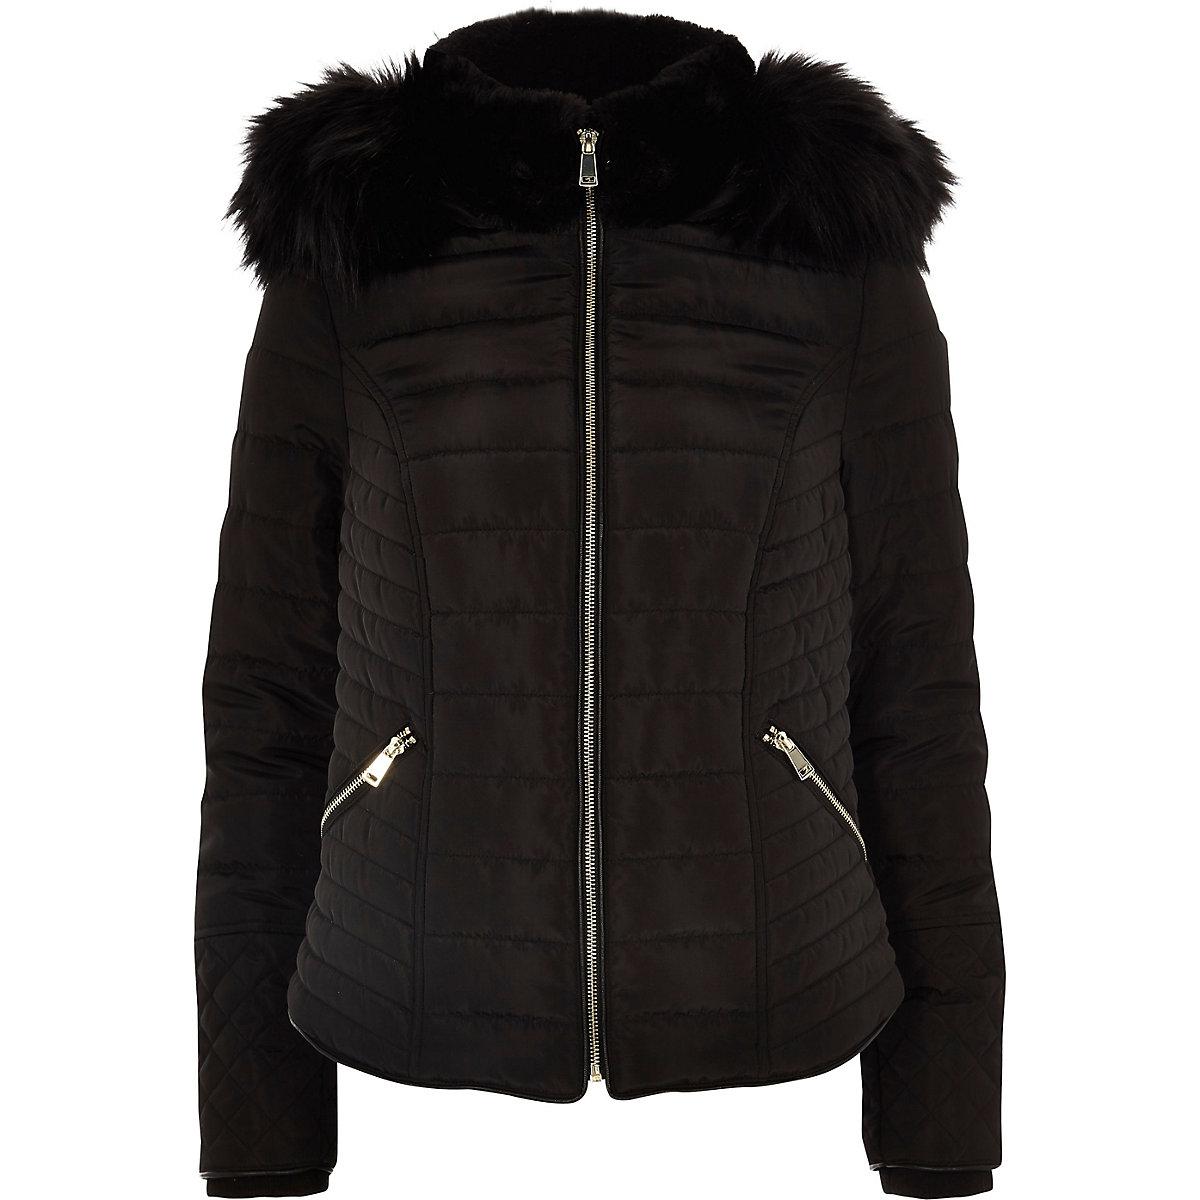 3497bf43475 Black faux fur hood long sleeve padded jacket - Jackets - Coats ...